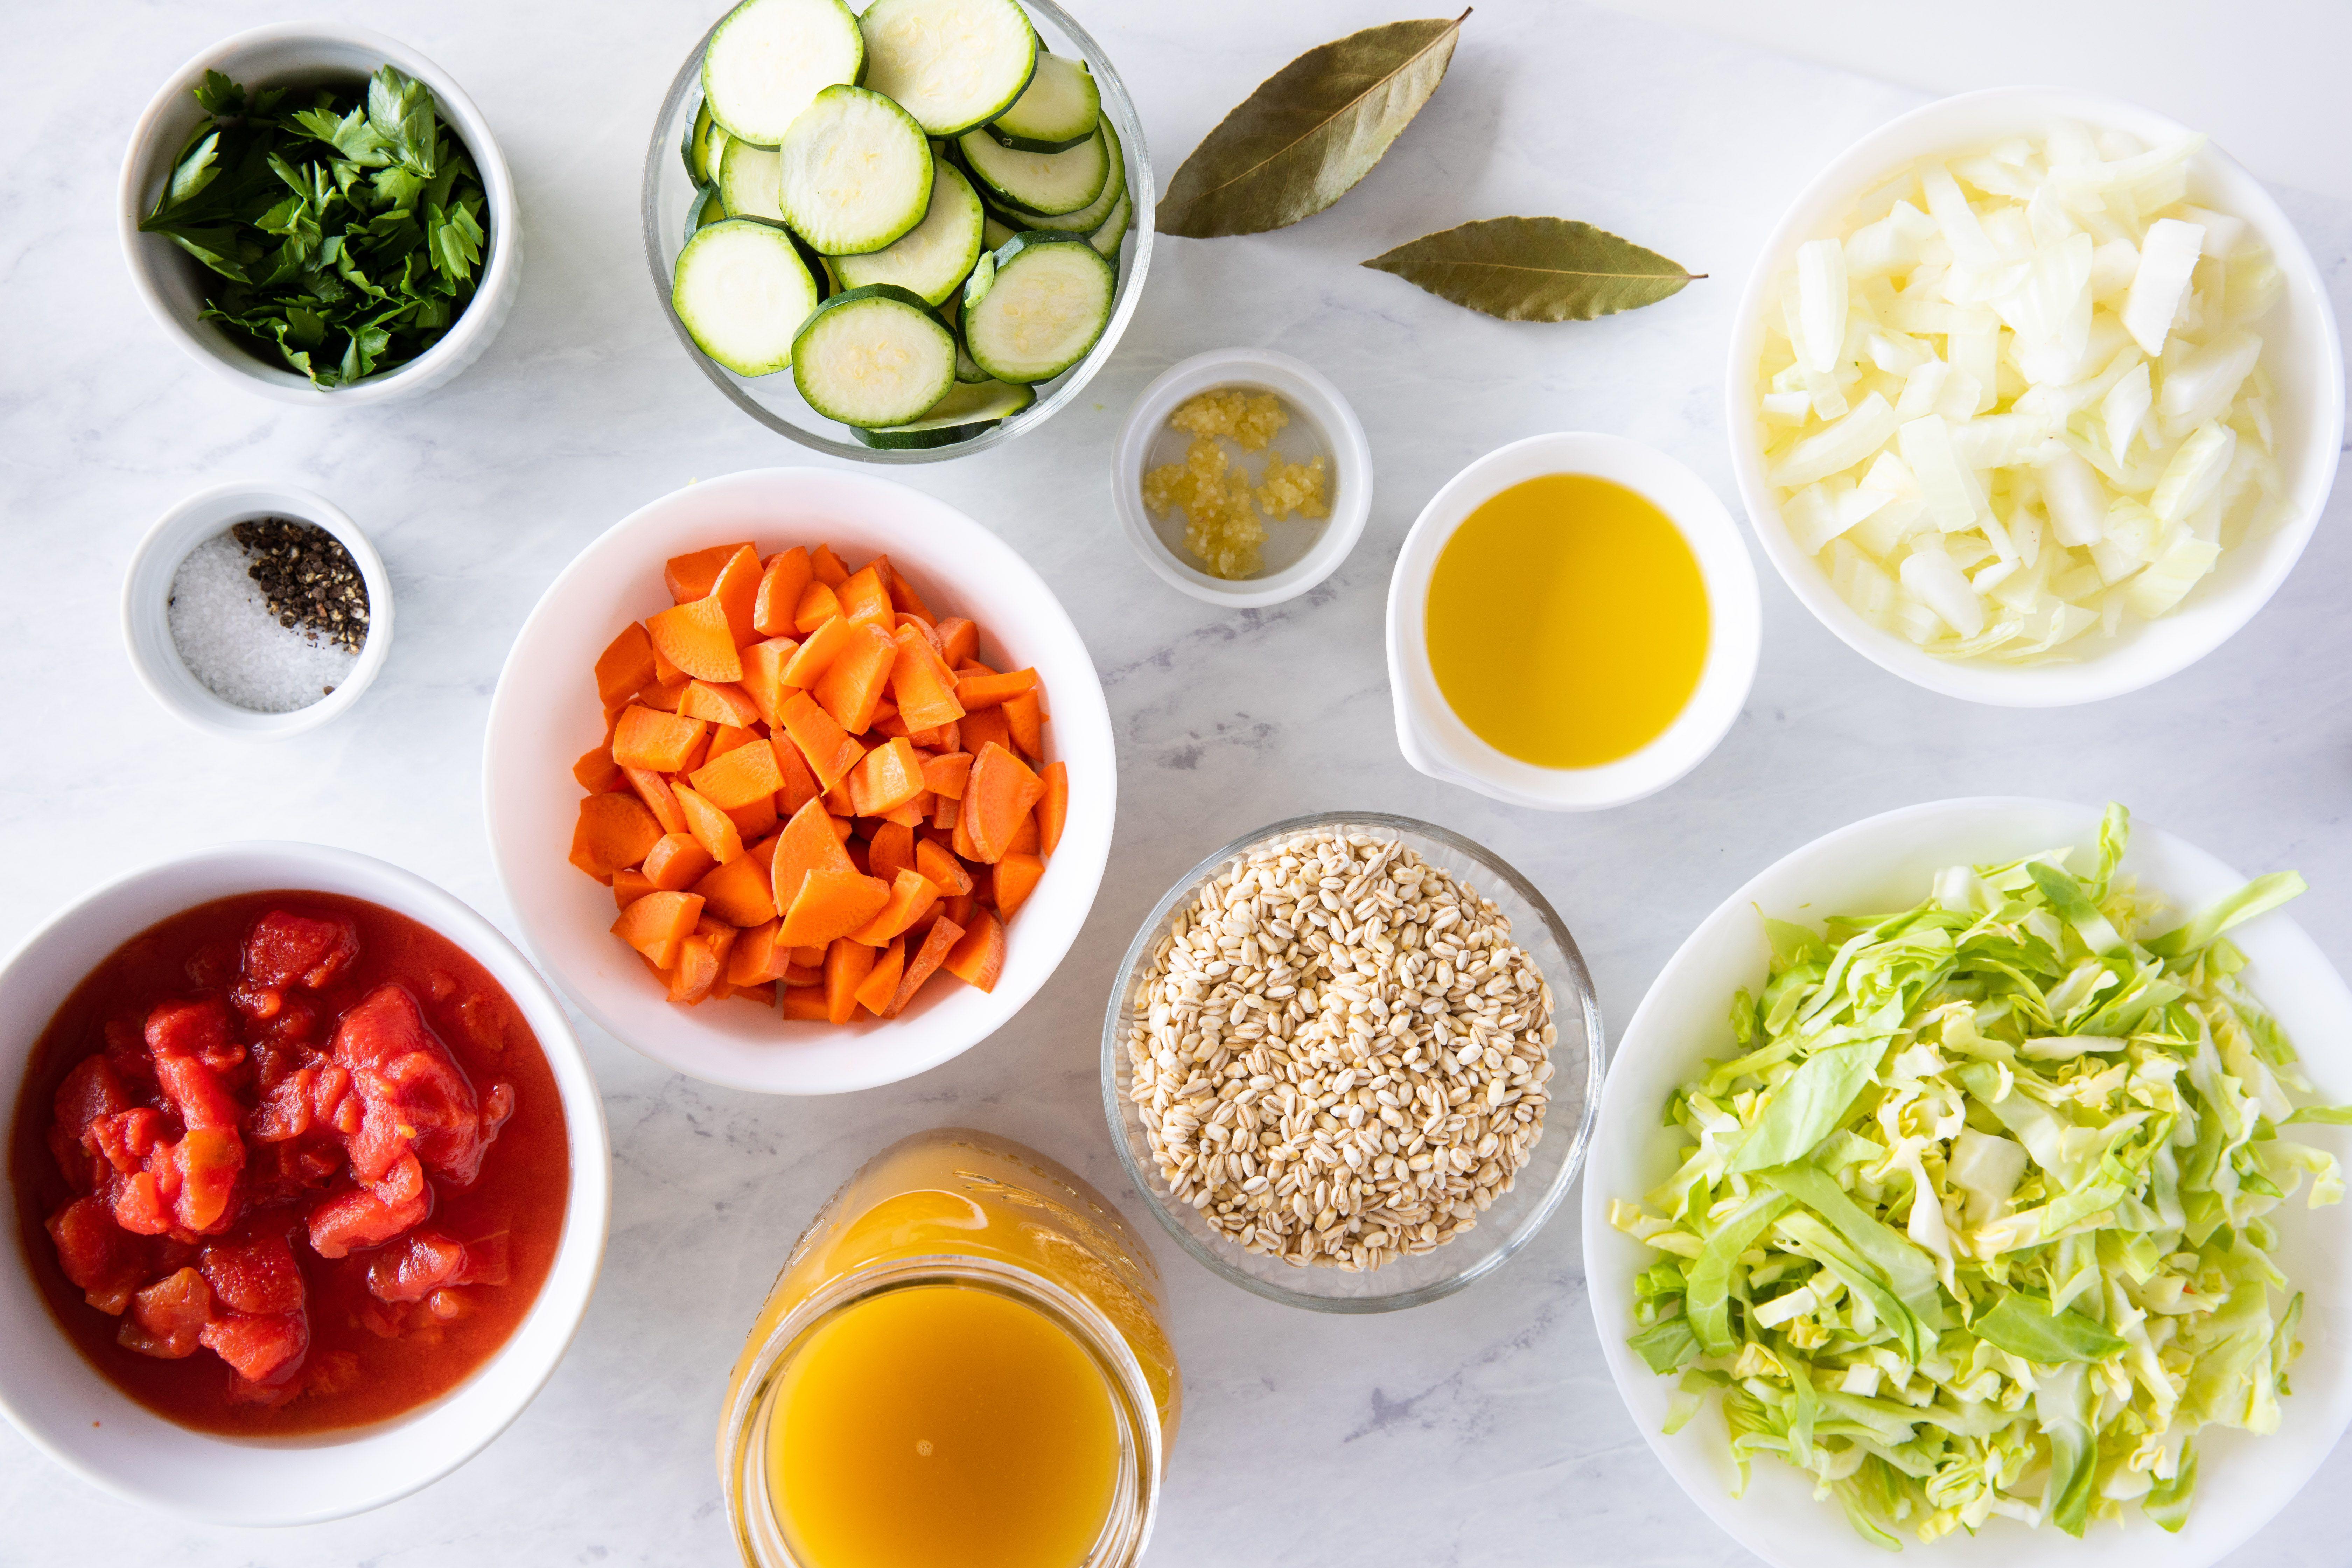 Ingredients for vegetarian barley soup